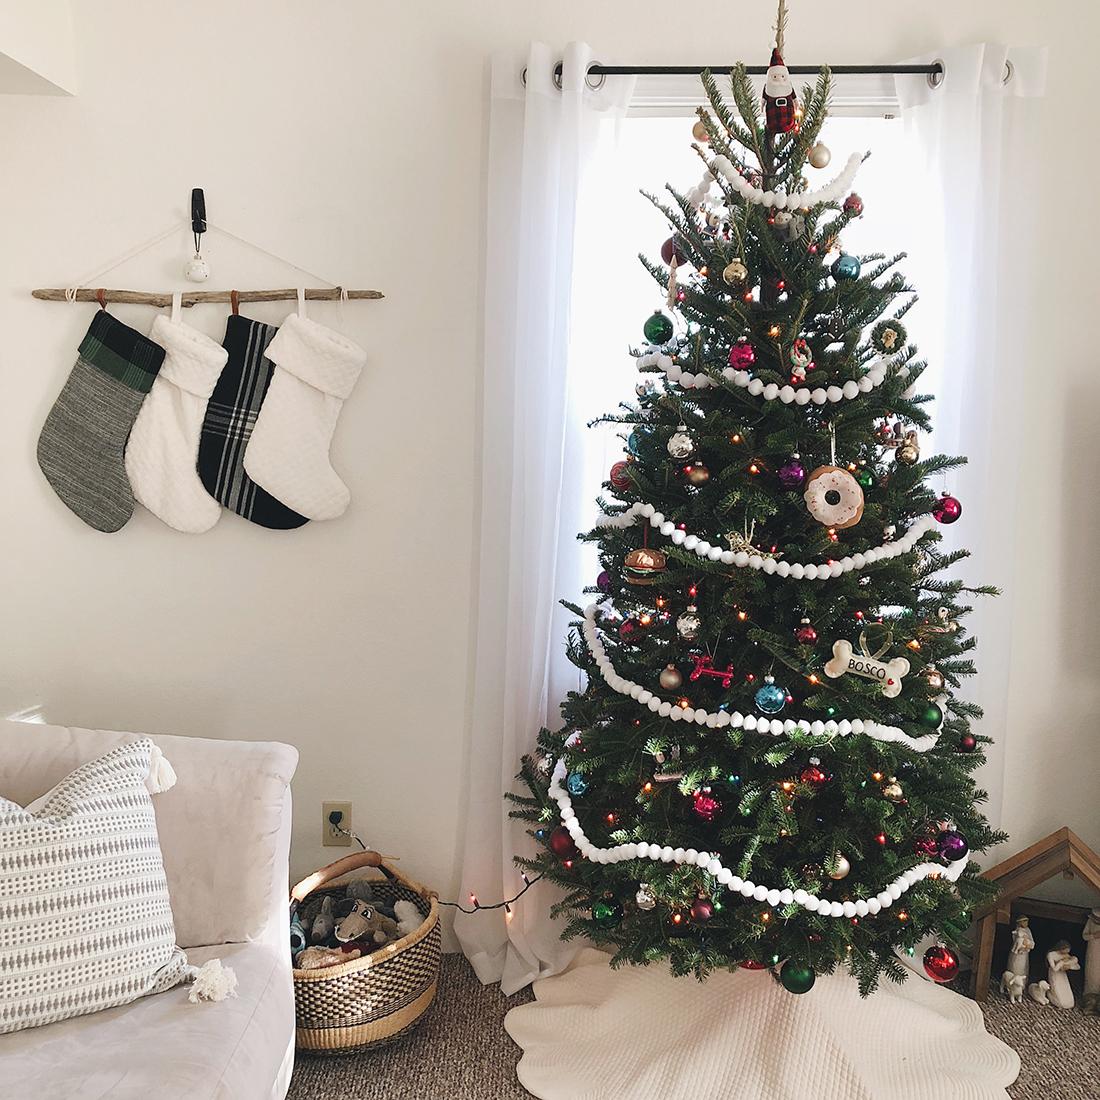 Christmas 2018 Recap